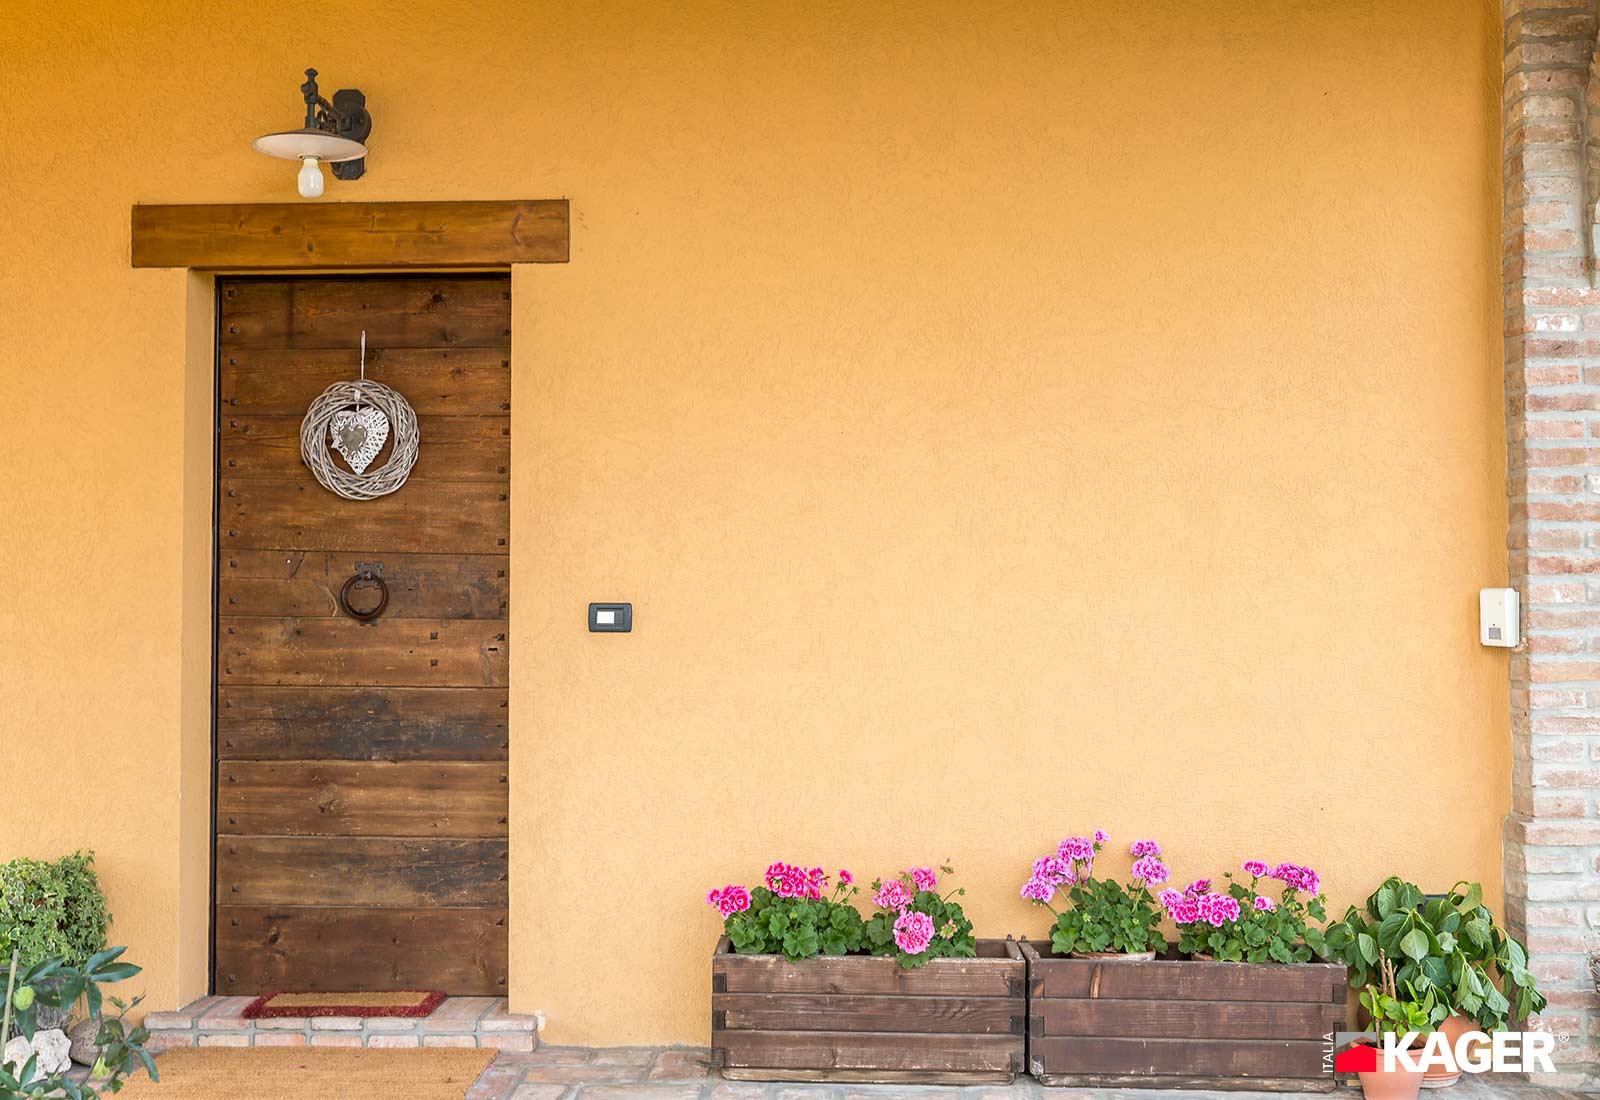 Casa-in-legno-Ferrara-Kager-Italia-09